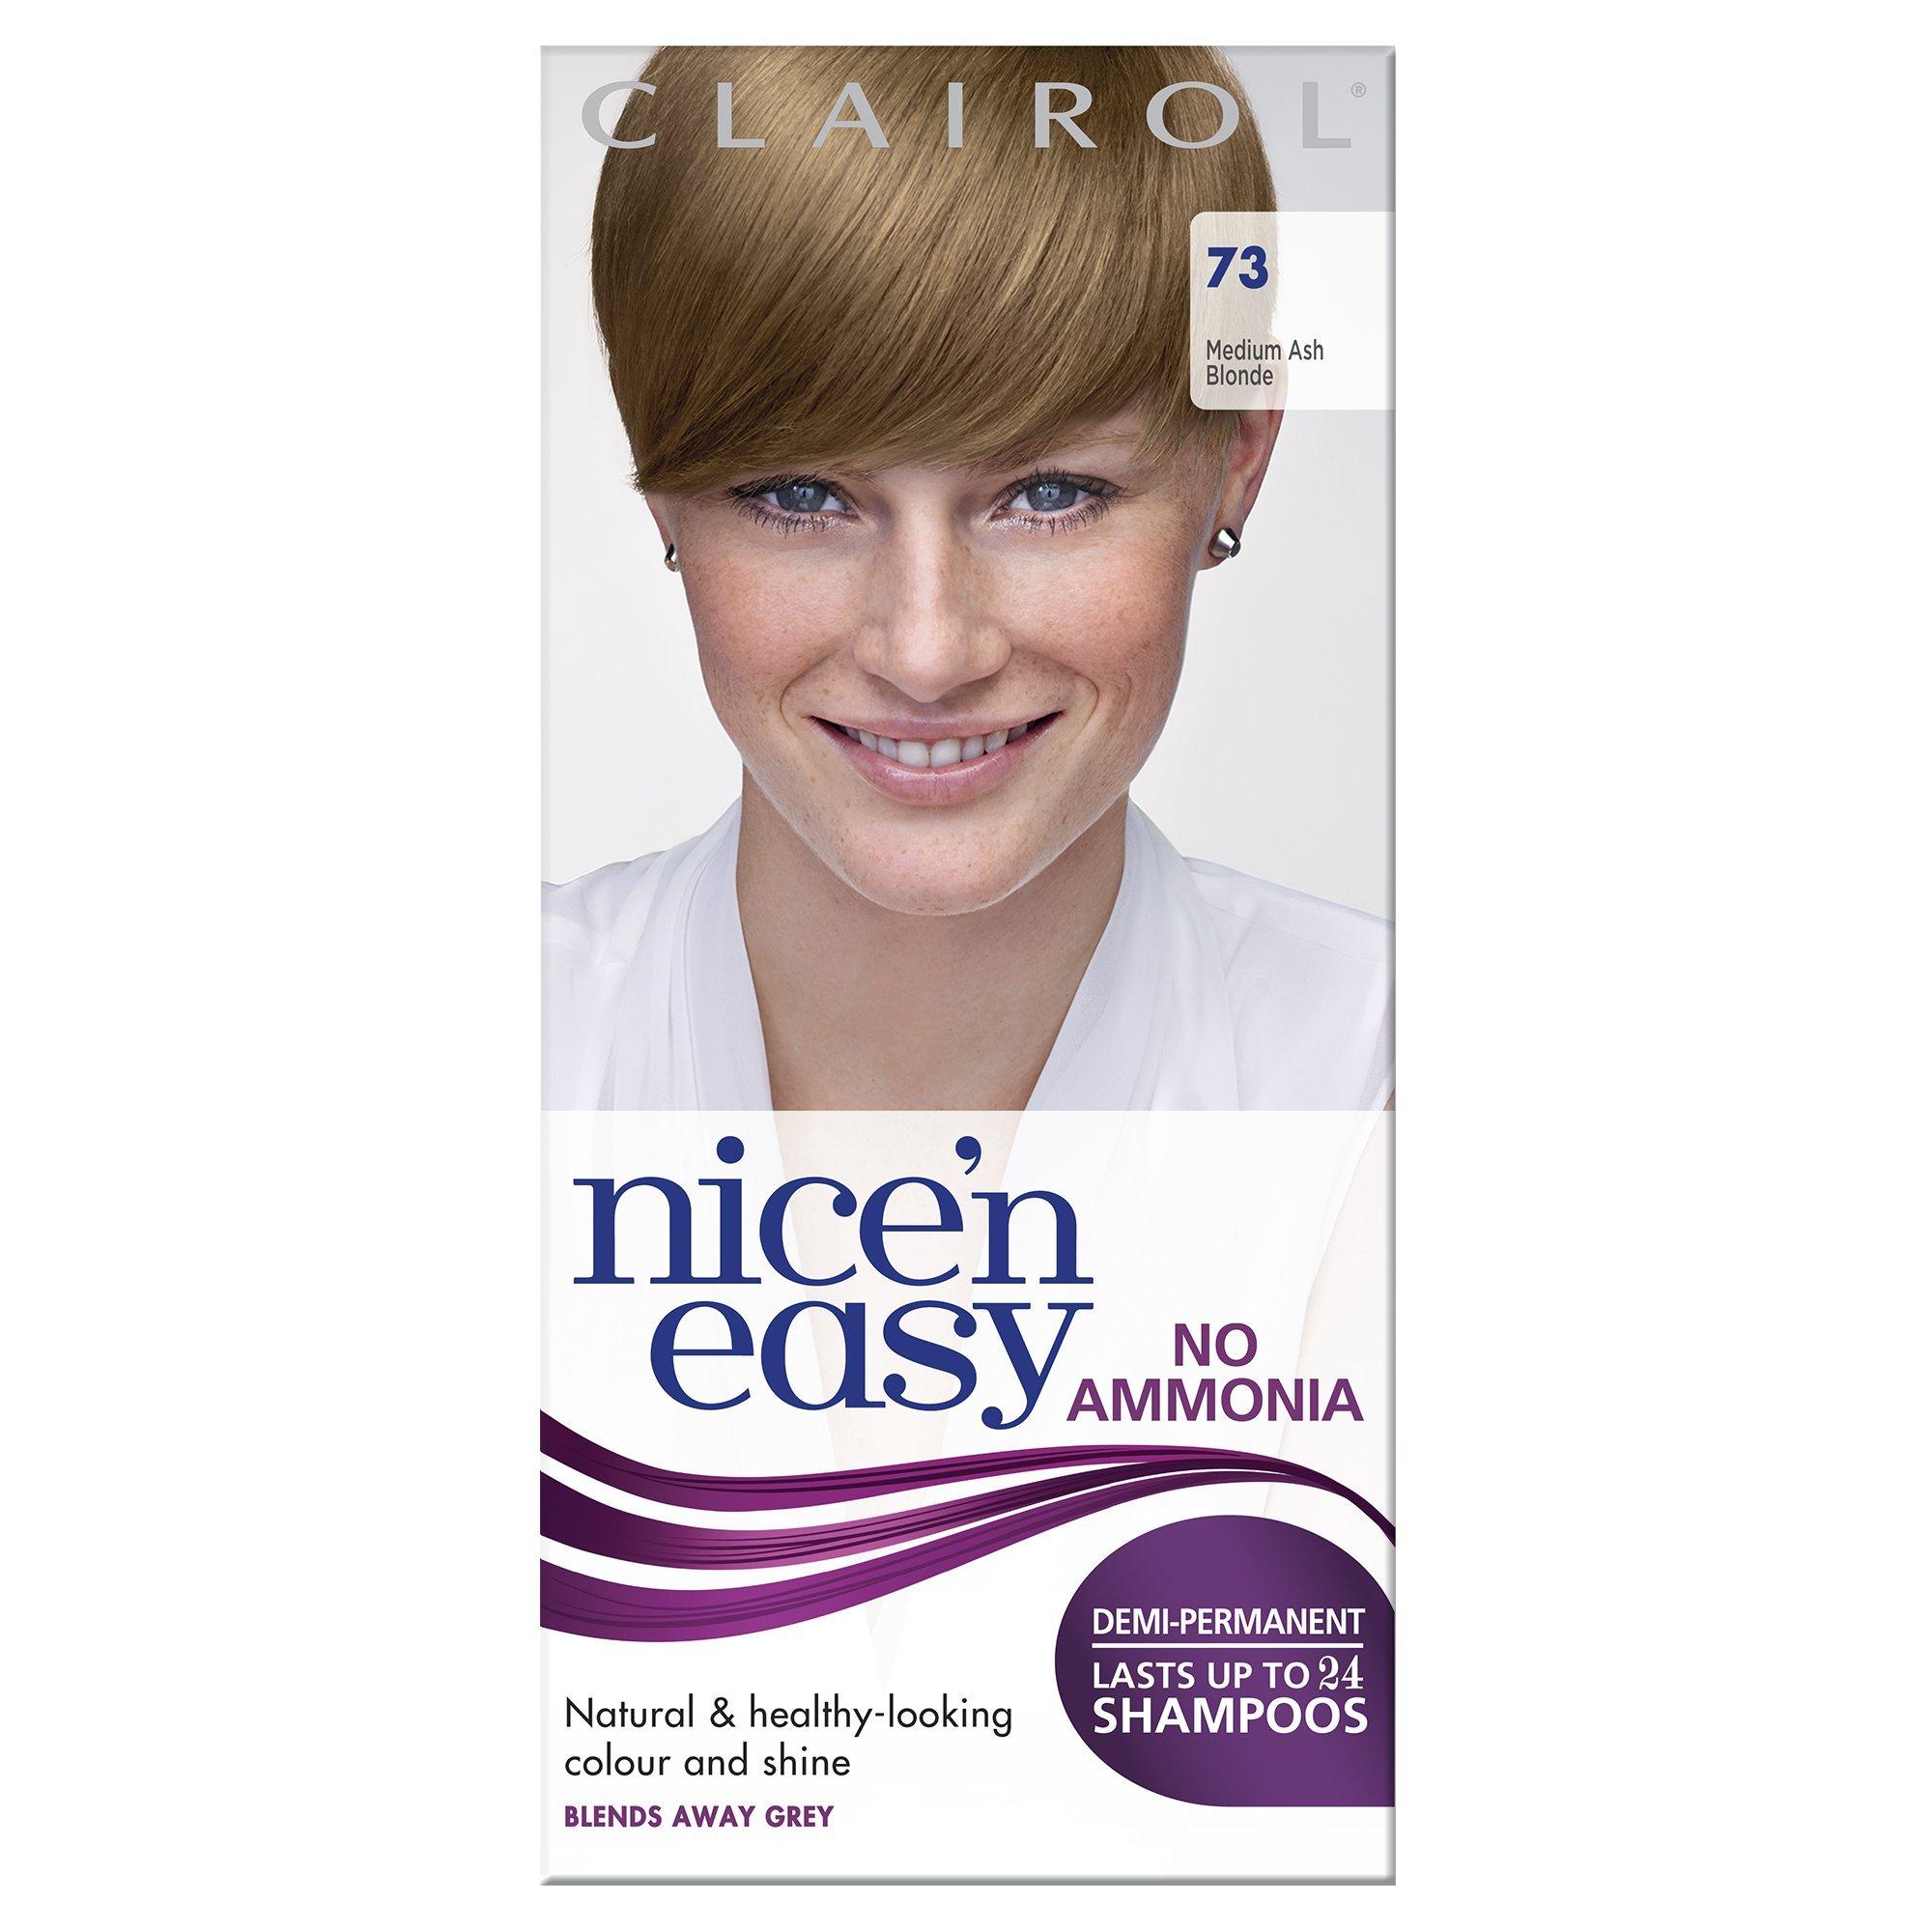 Clairol Nice'n Easy Semi-Permanent Hair Dye No Ammonia 73 Ash Blonde